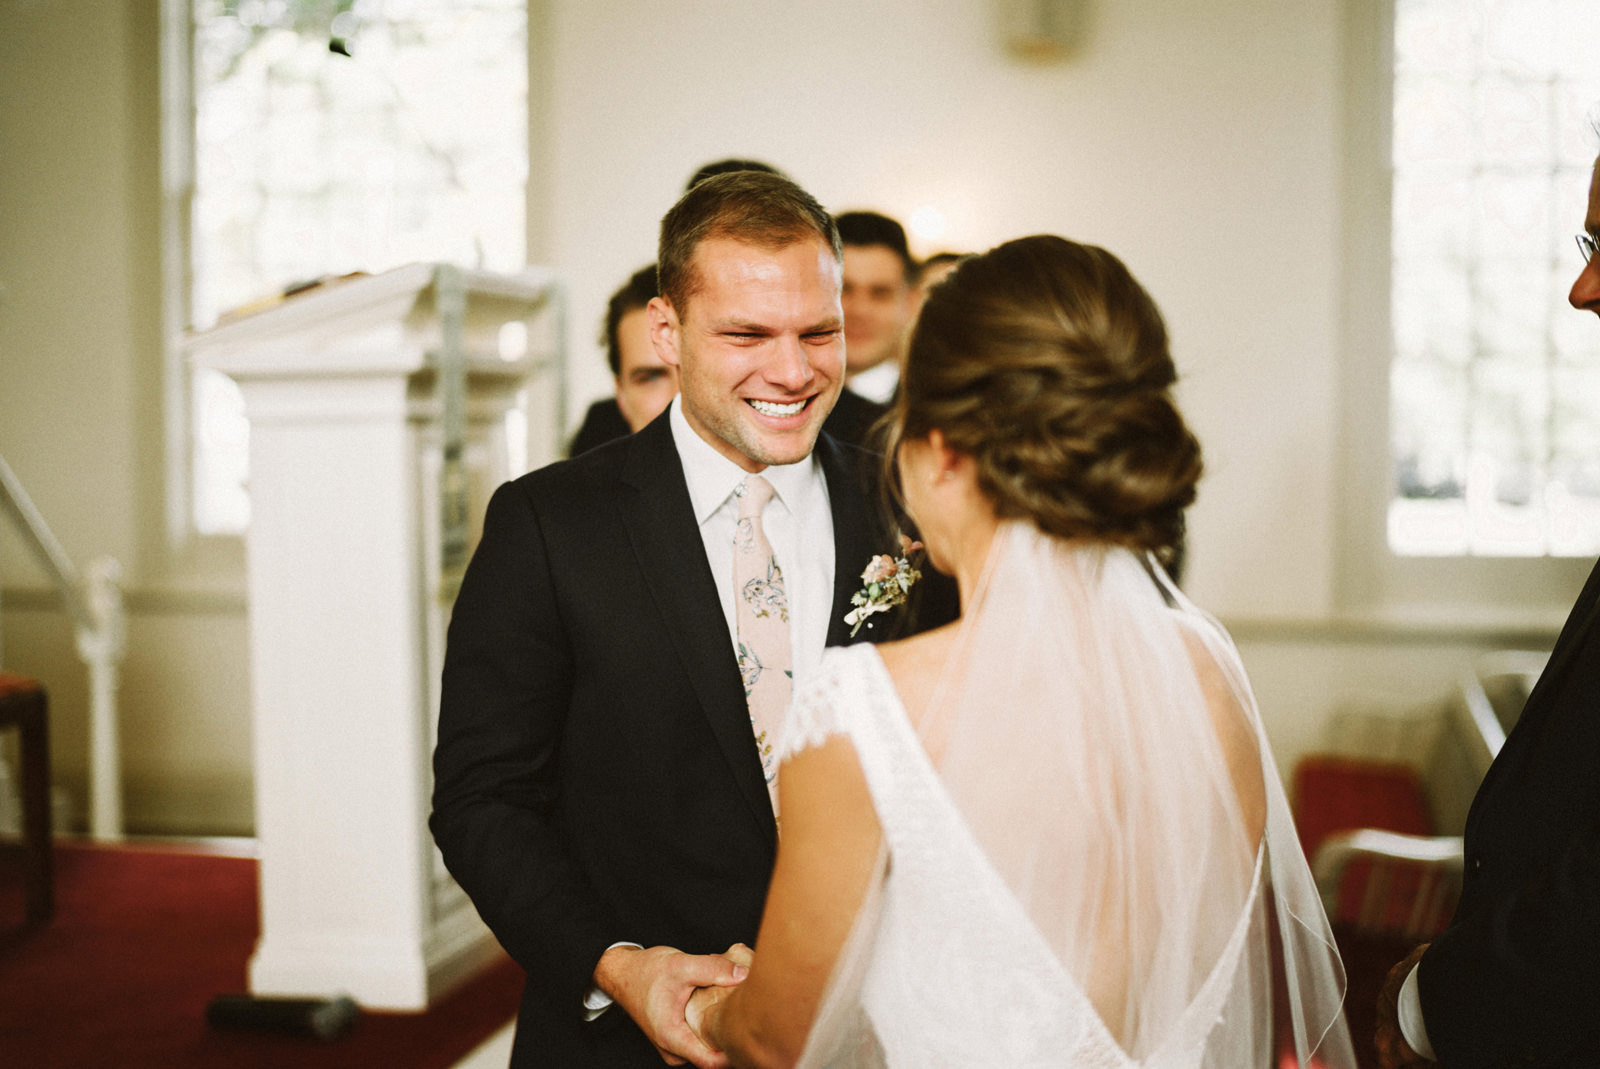 bridgeport-wedding-054 BRIDGEPORT, CONNECTICUT BACKYARD WEDDING